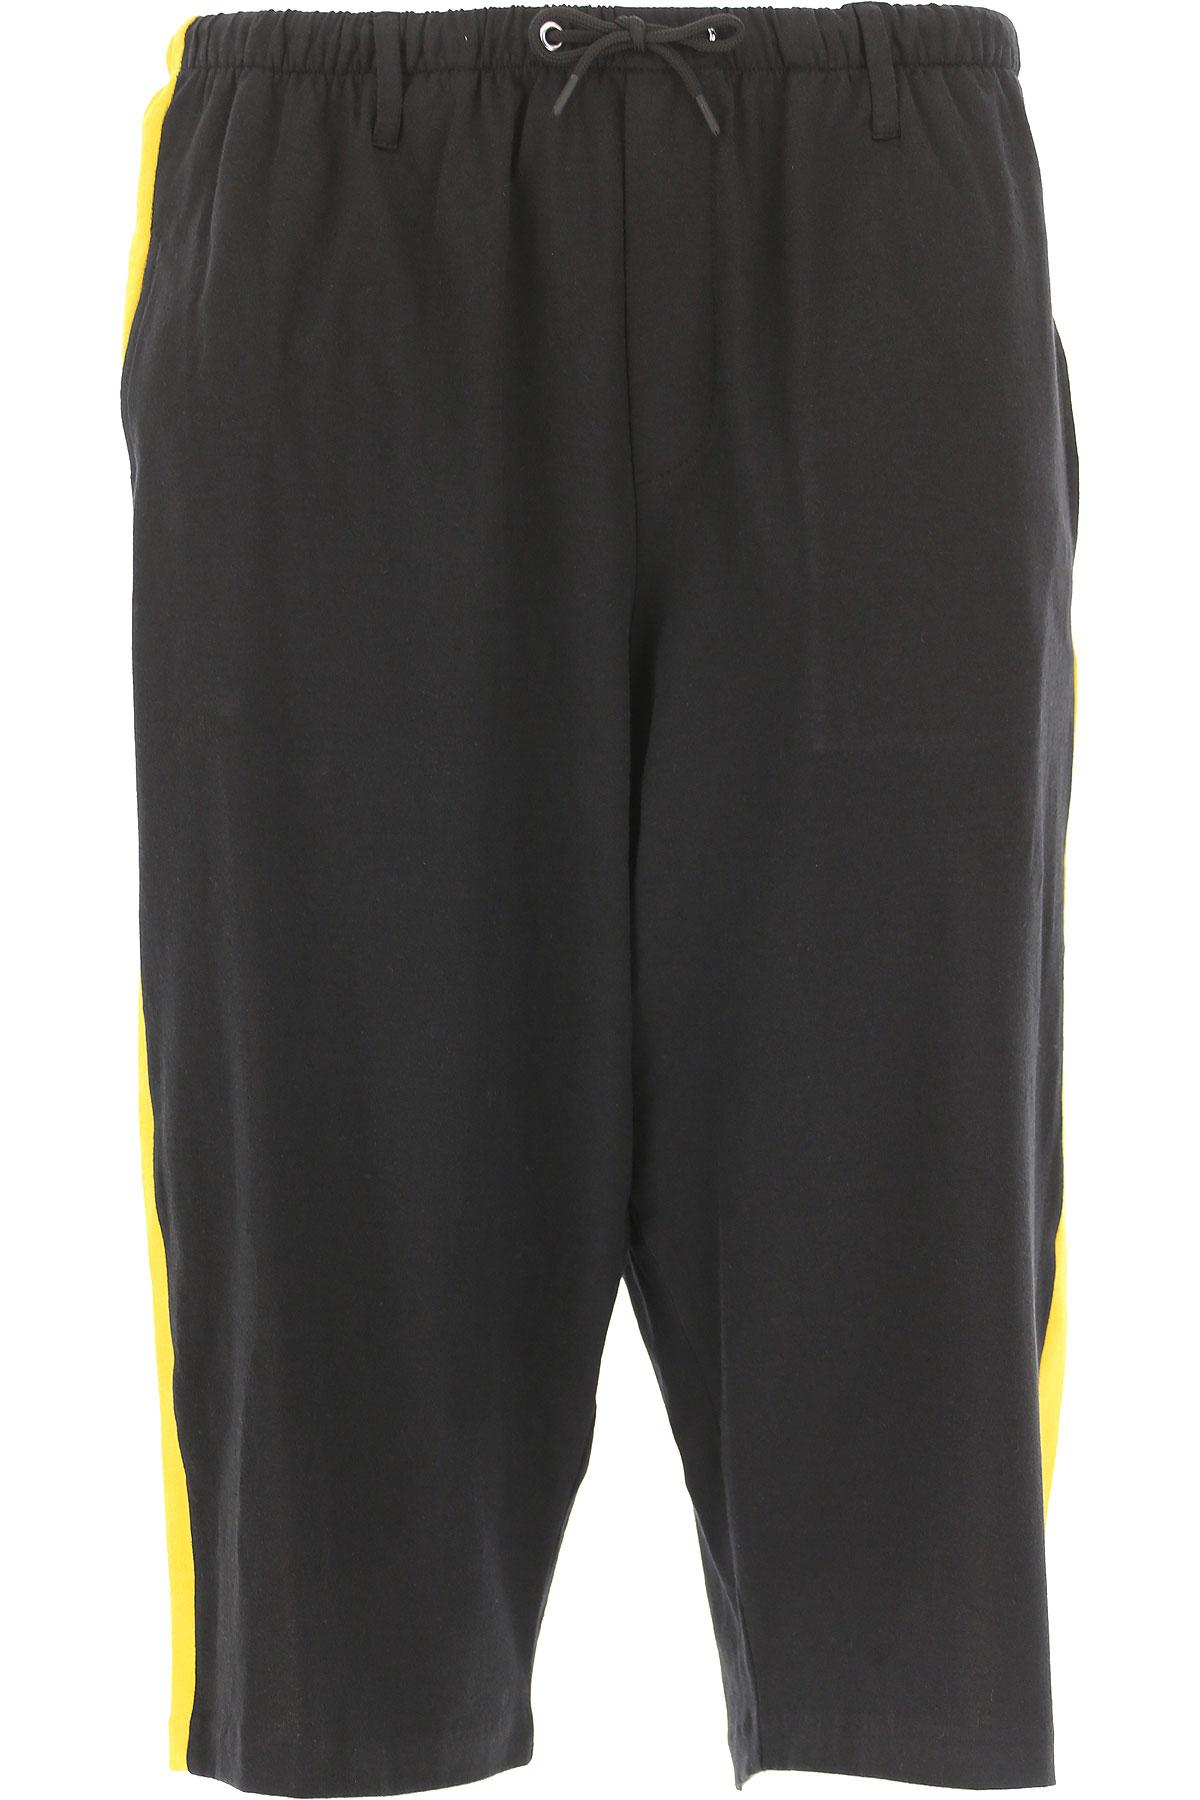 Alexander McQueen McQ Pants for Men On Sale in Outlet, Black, Cotton, 2019, L M S XL